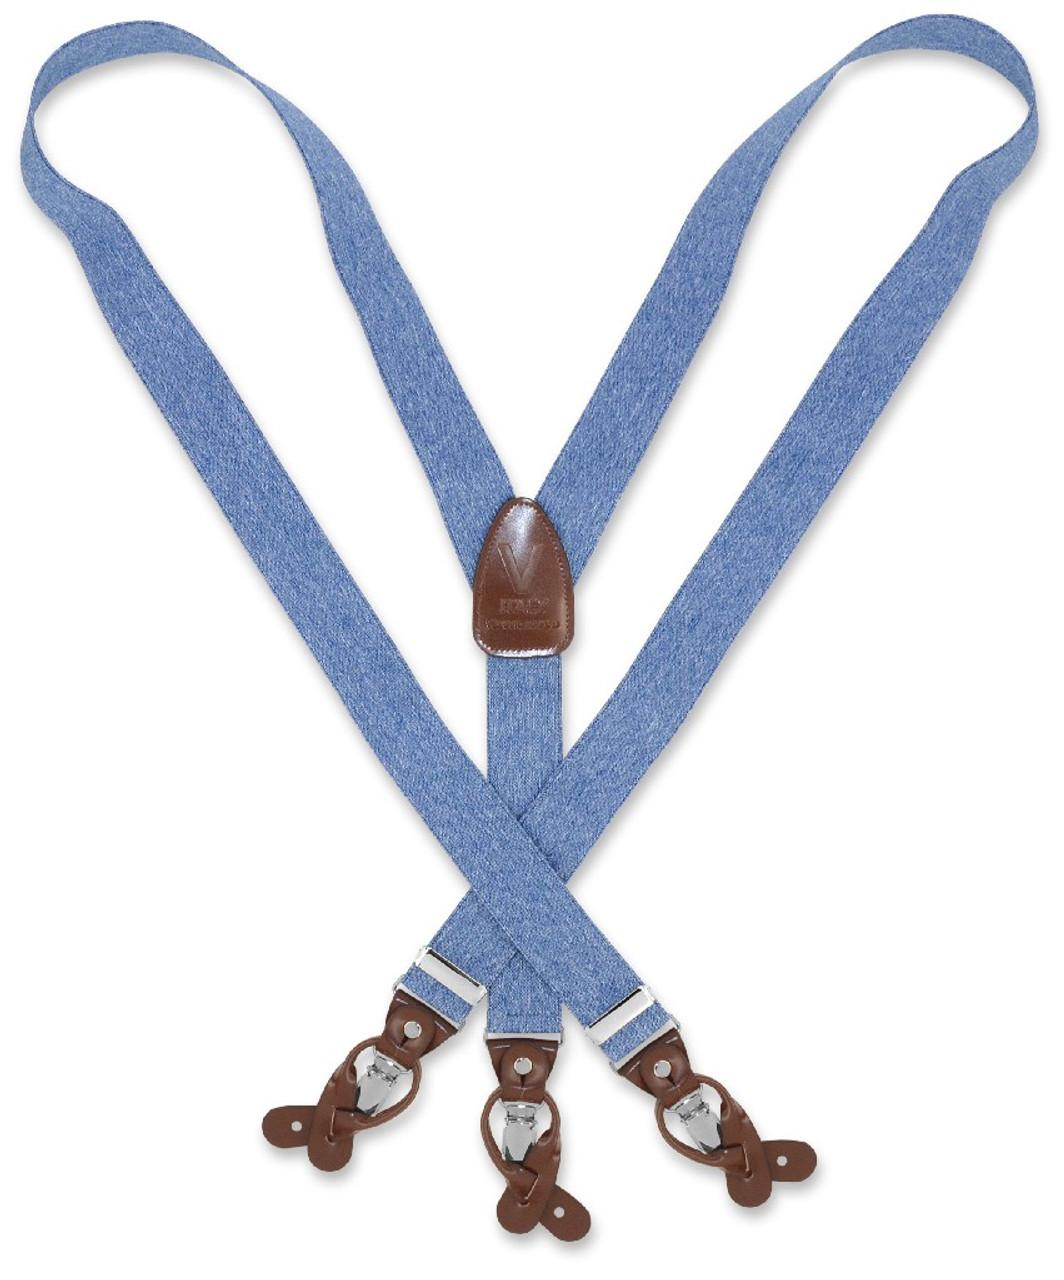 Men/'s Adjustable Suspenders For Shirts Pants Jeans Clip-On Braces Elastic Y-Back